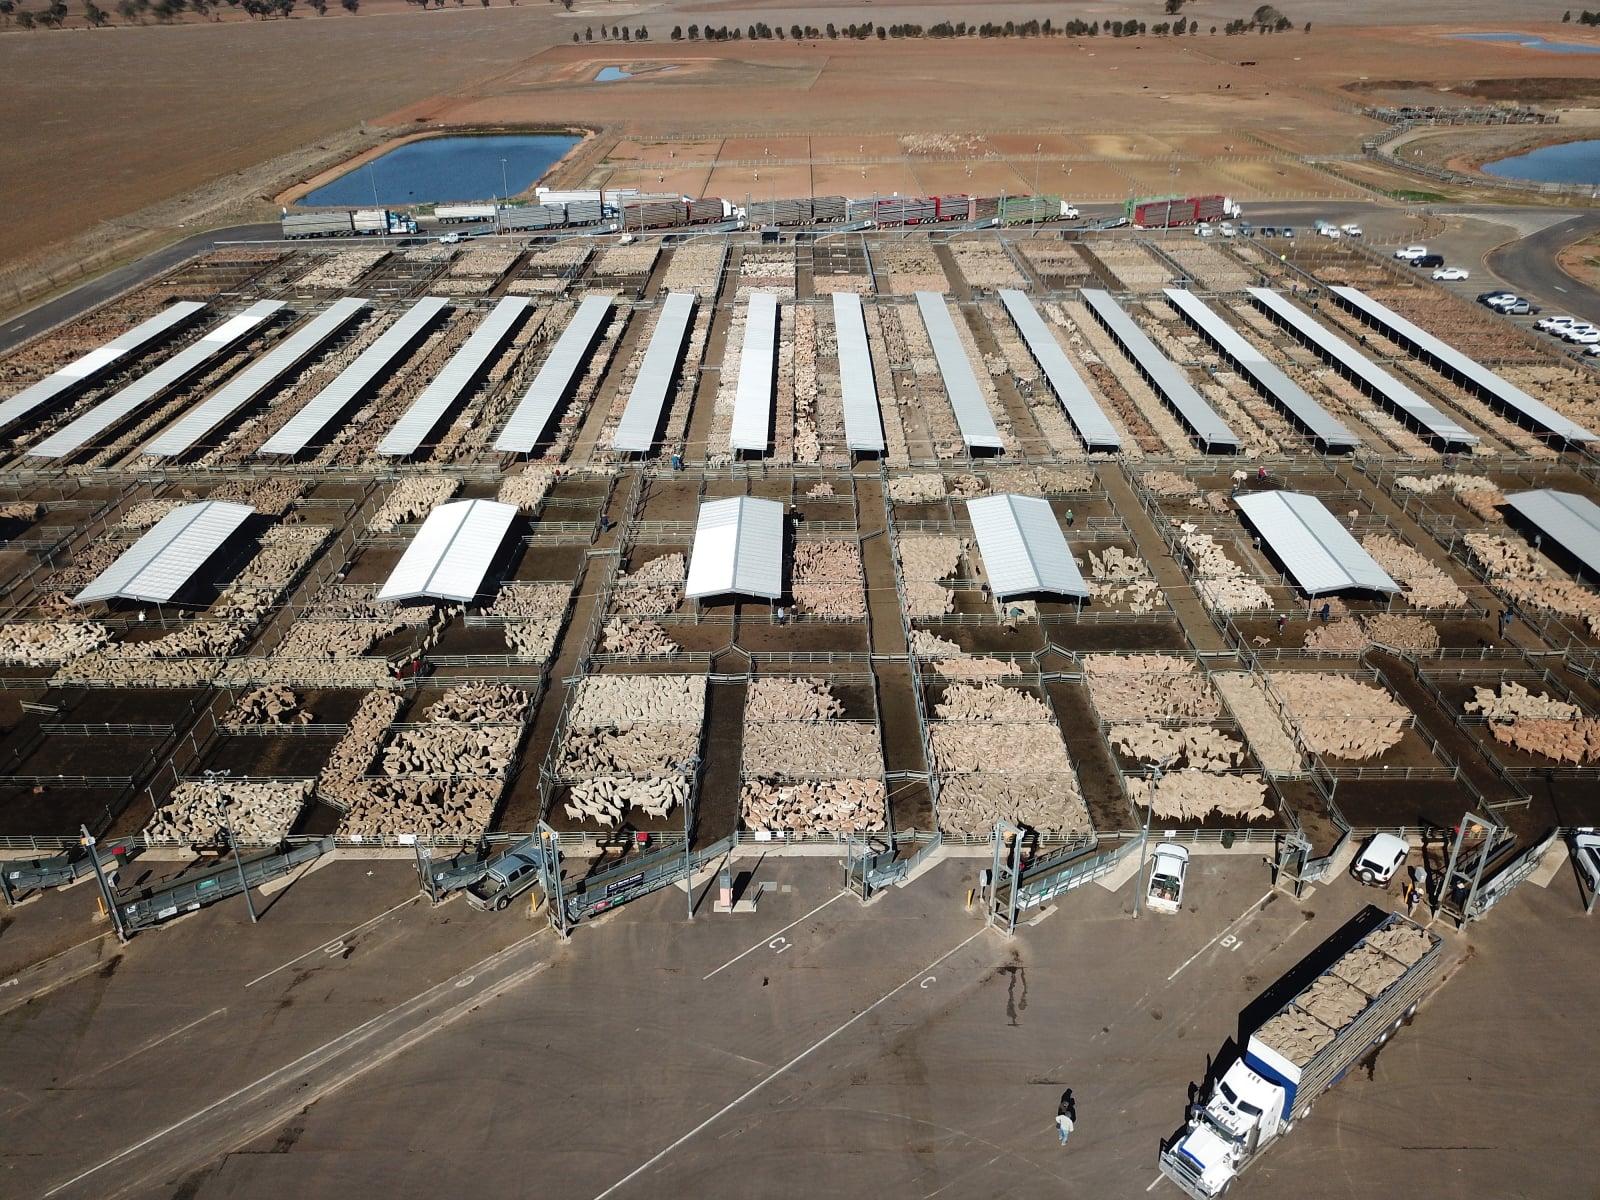 Susza w Australii fot. EPA/DEAN LEWINS